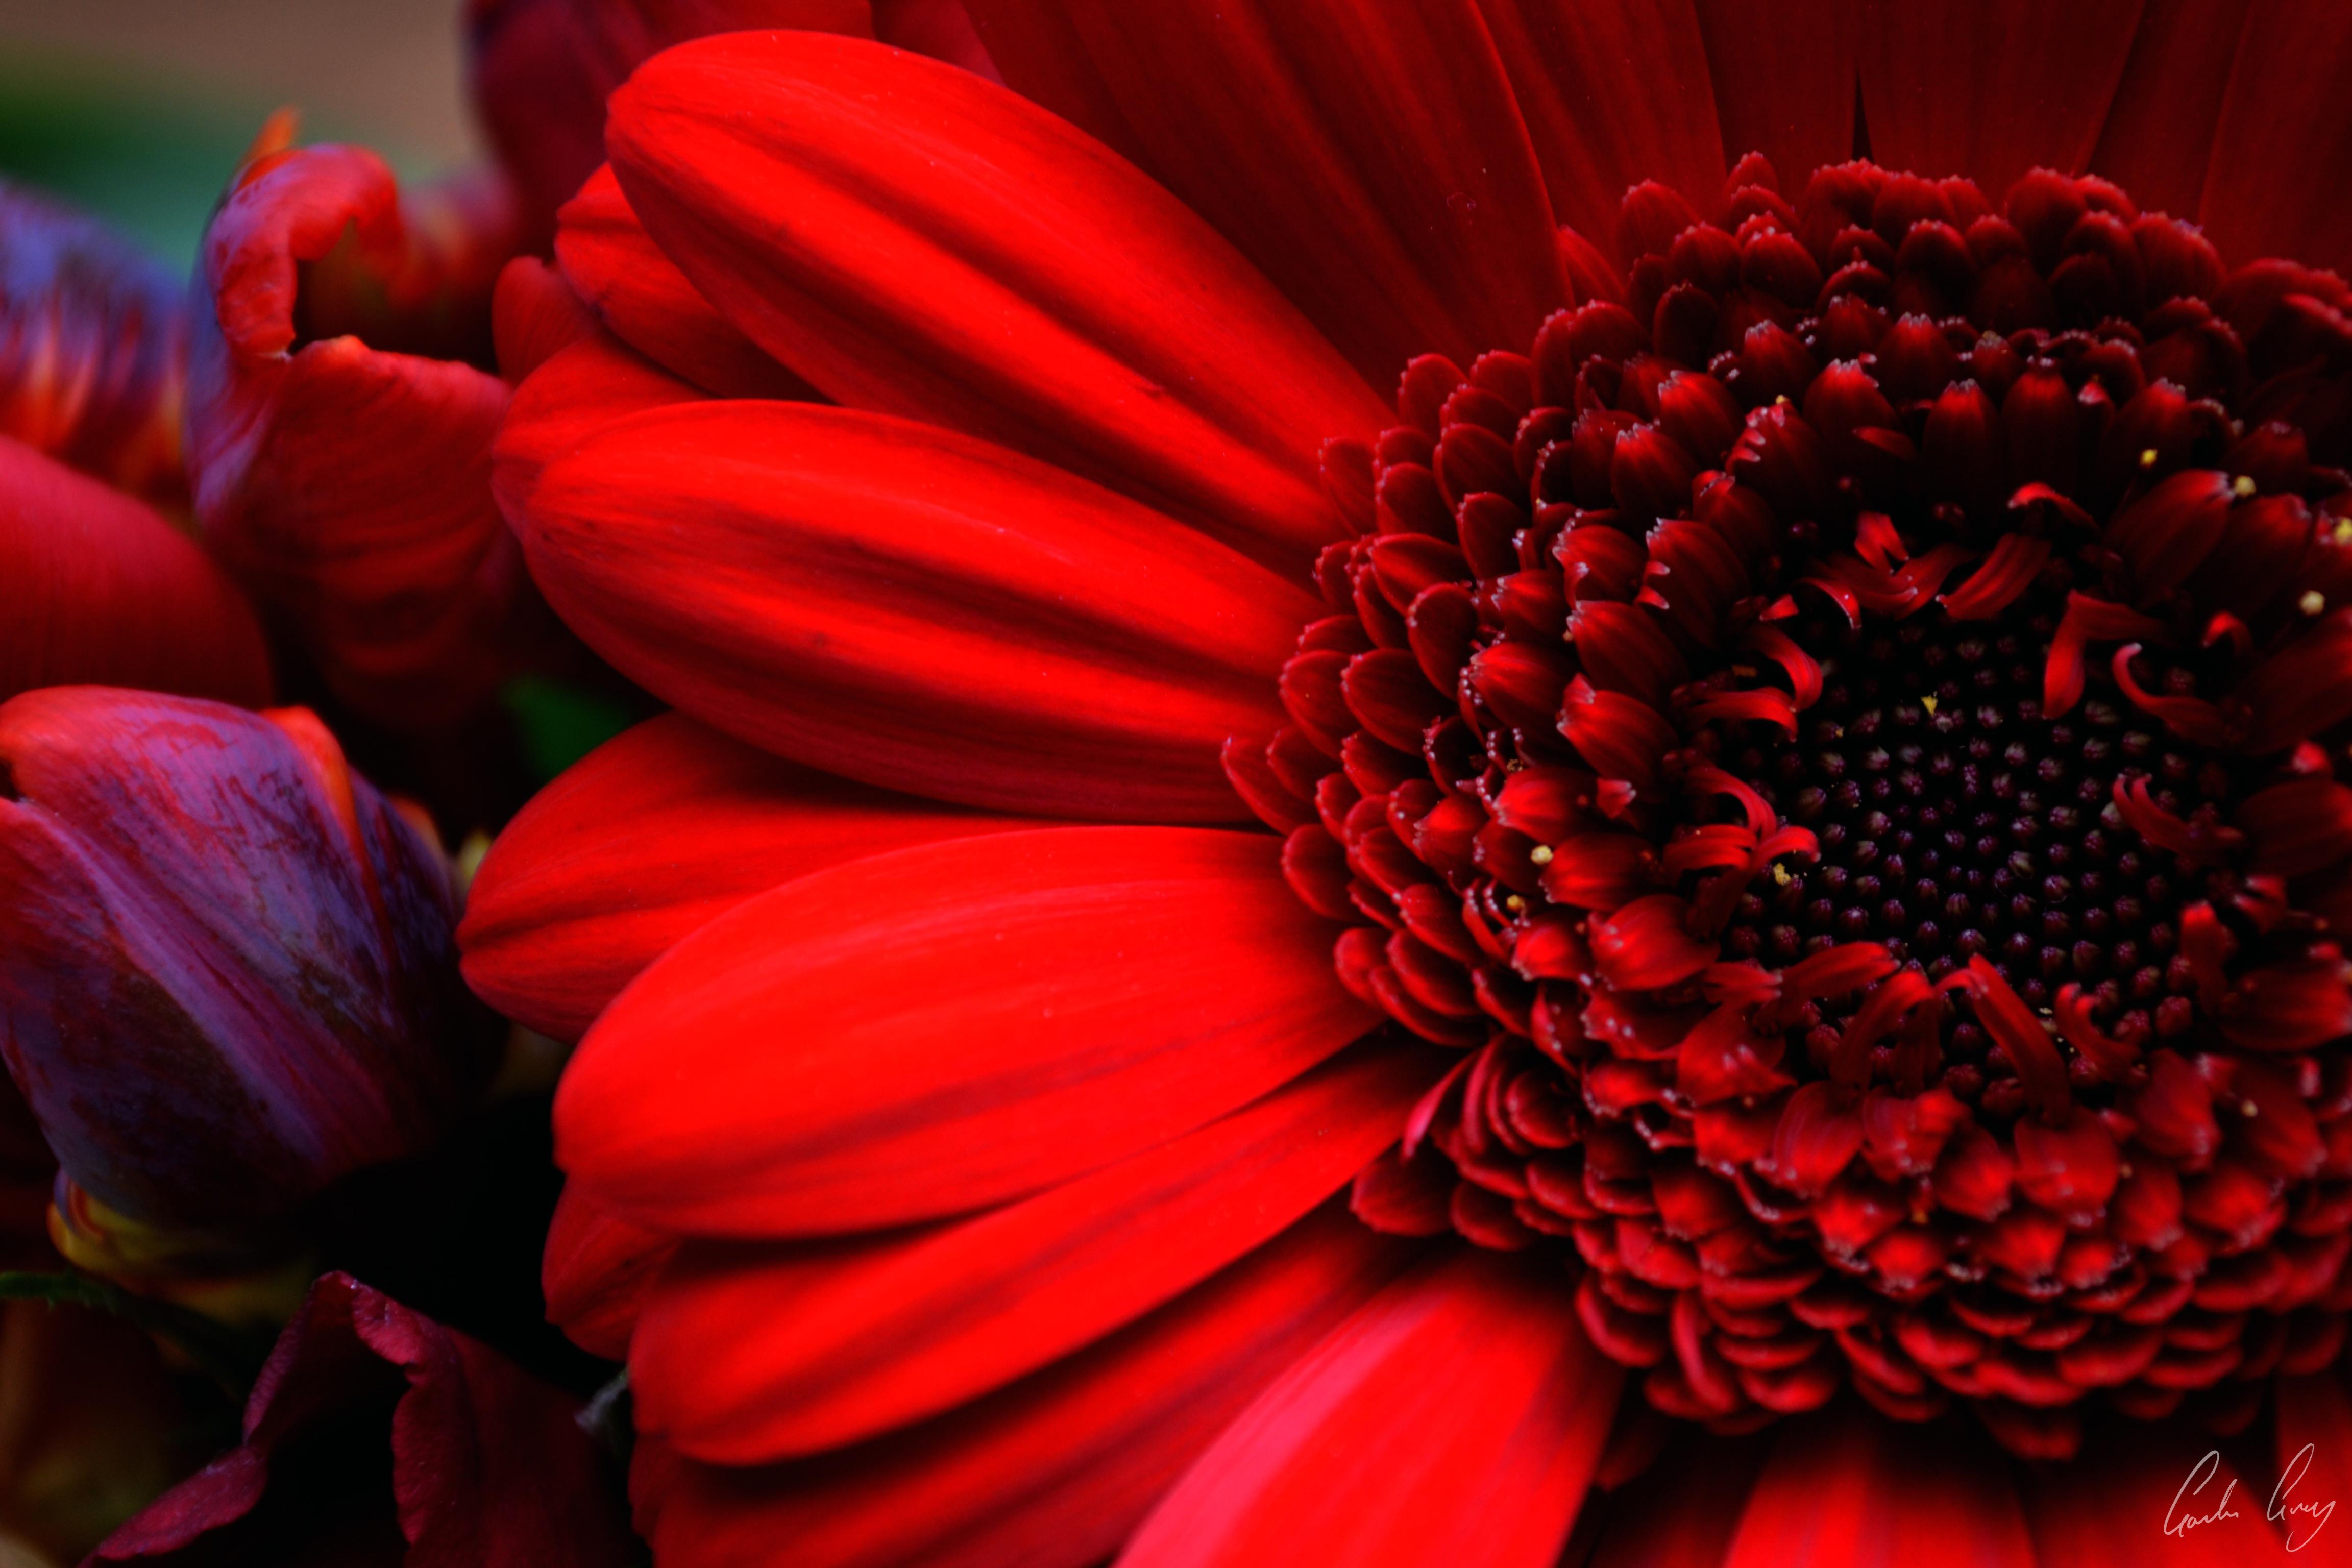 Wallpaper flowers red color colour texture love nature flowers red color colour texture love nature beauty closeup vibrant colorfull compassion romance passion complexity colourful izmirmasajfo